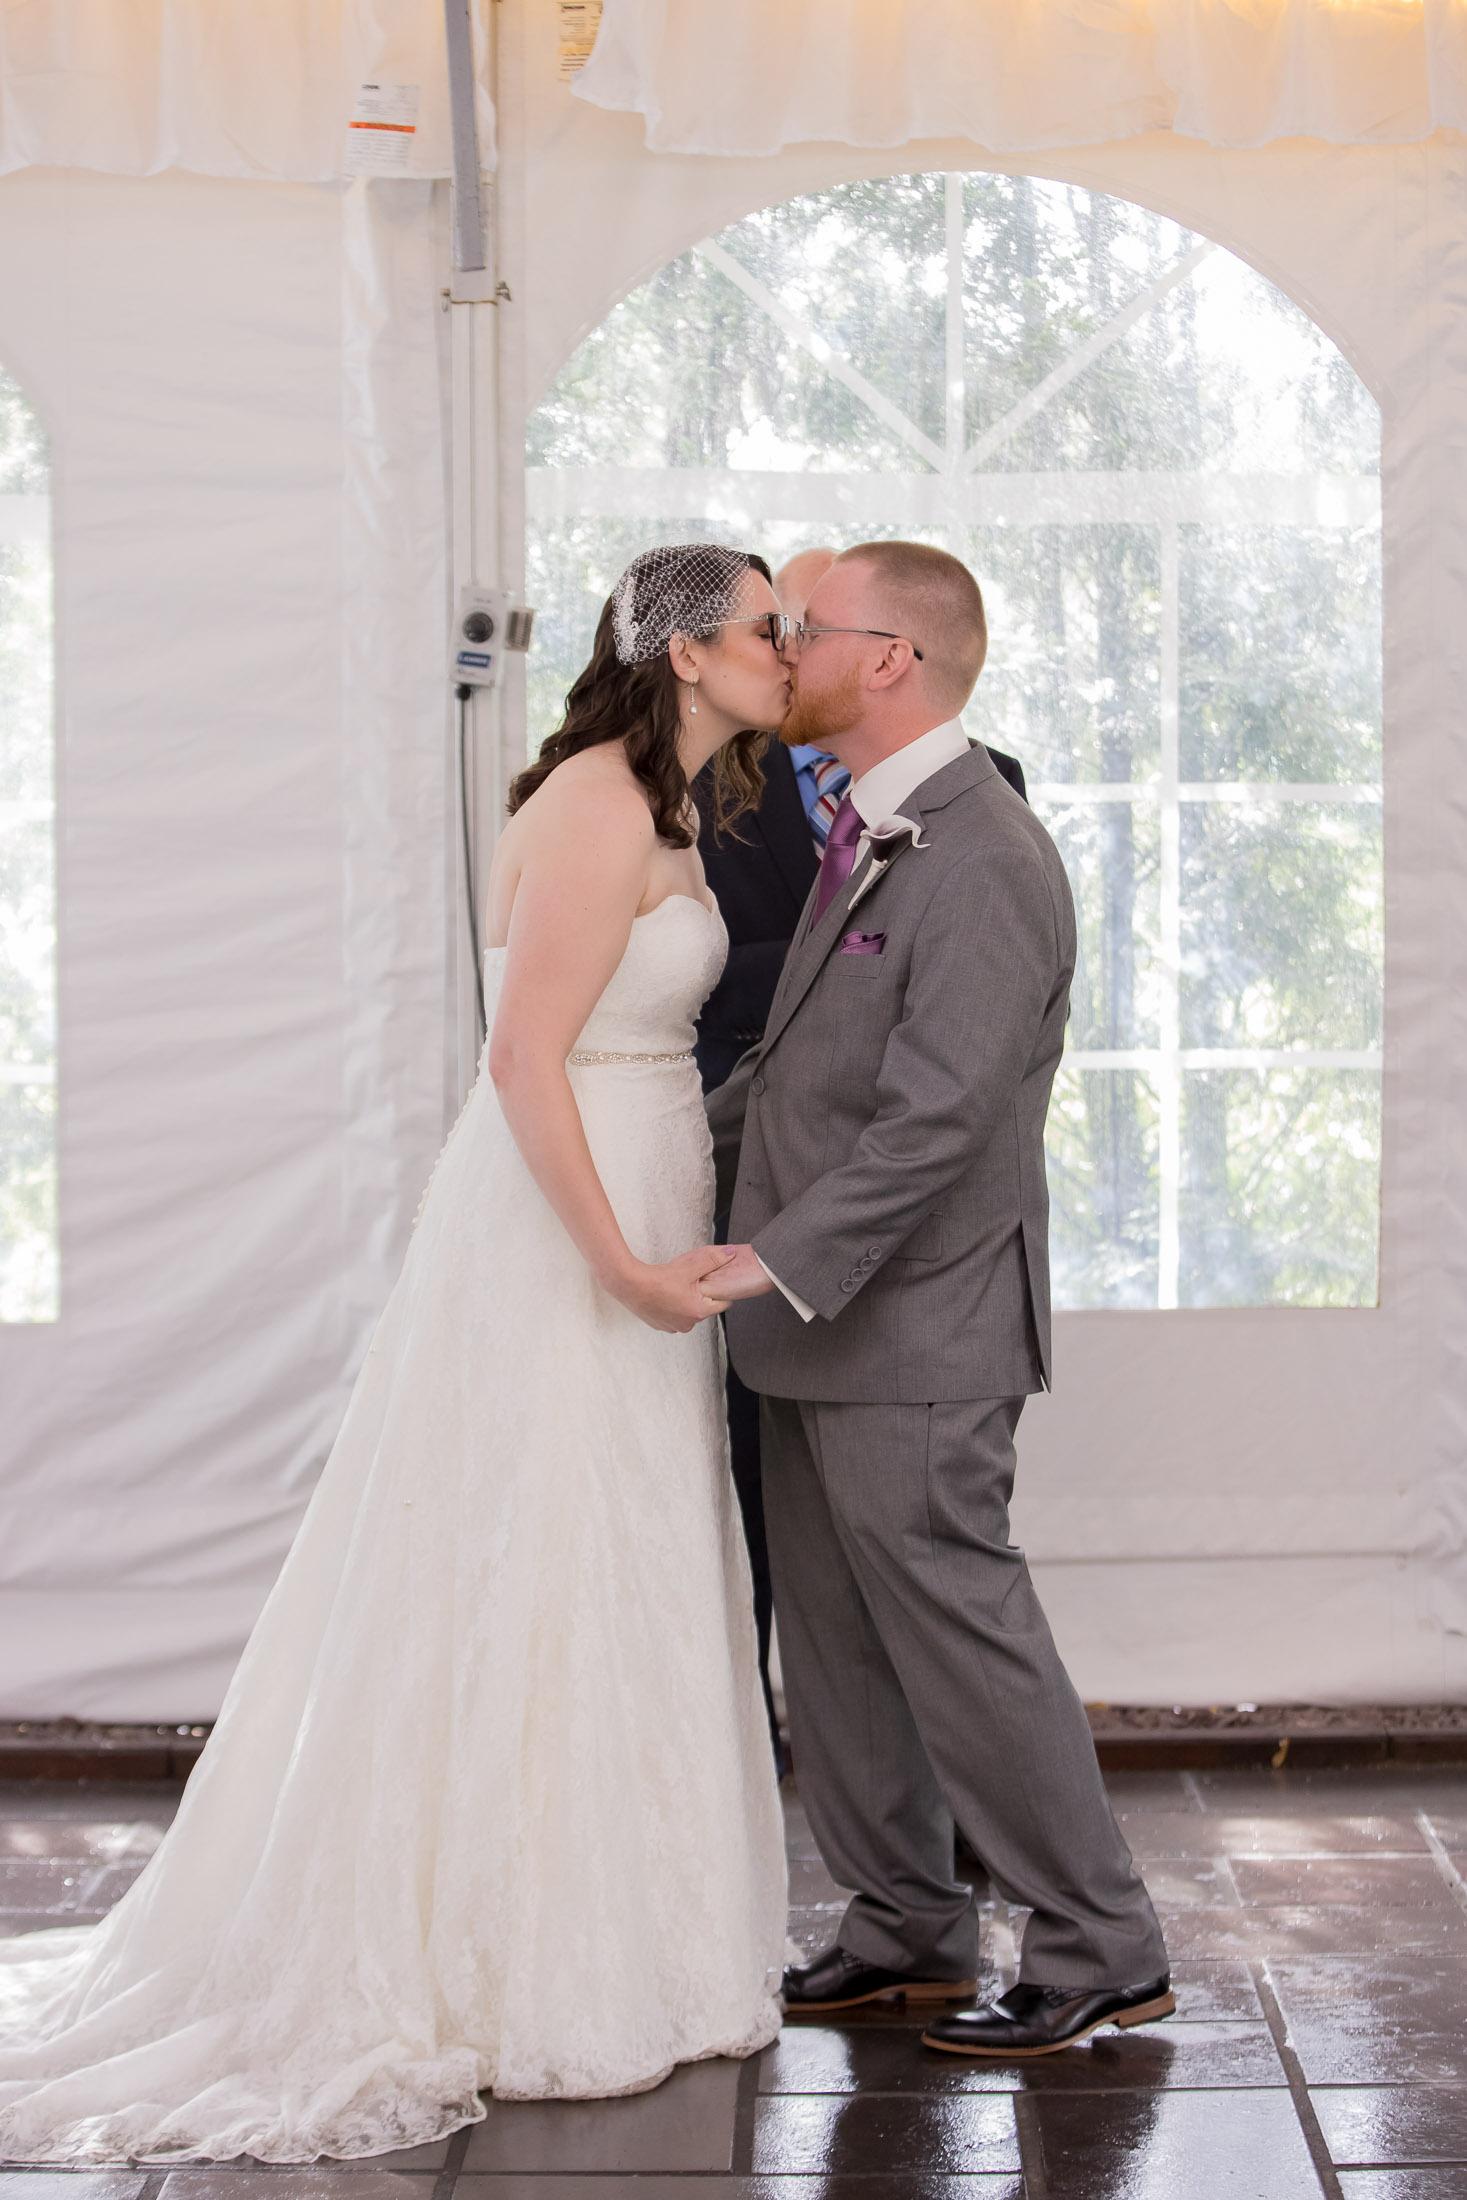 kiss, ceremony, wedding, tracy jenkins photography, publick house, Massachusetts, new england,  photography